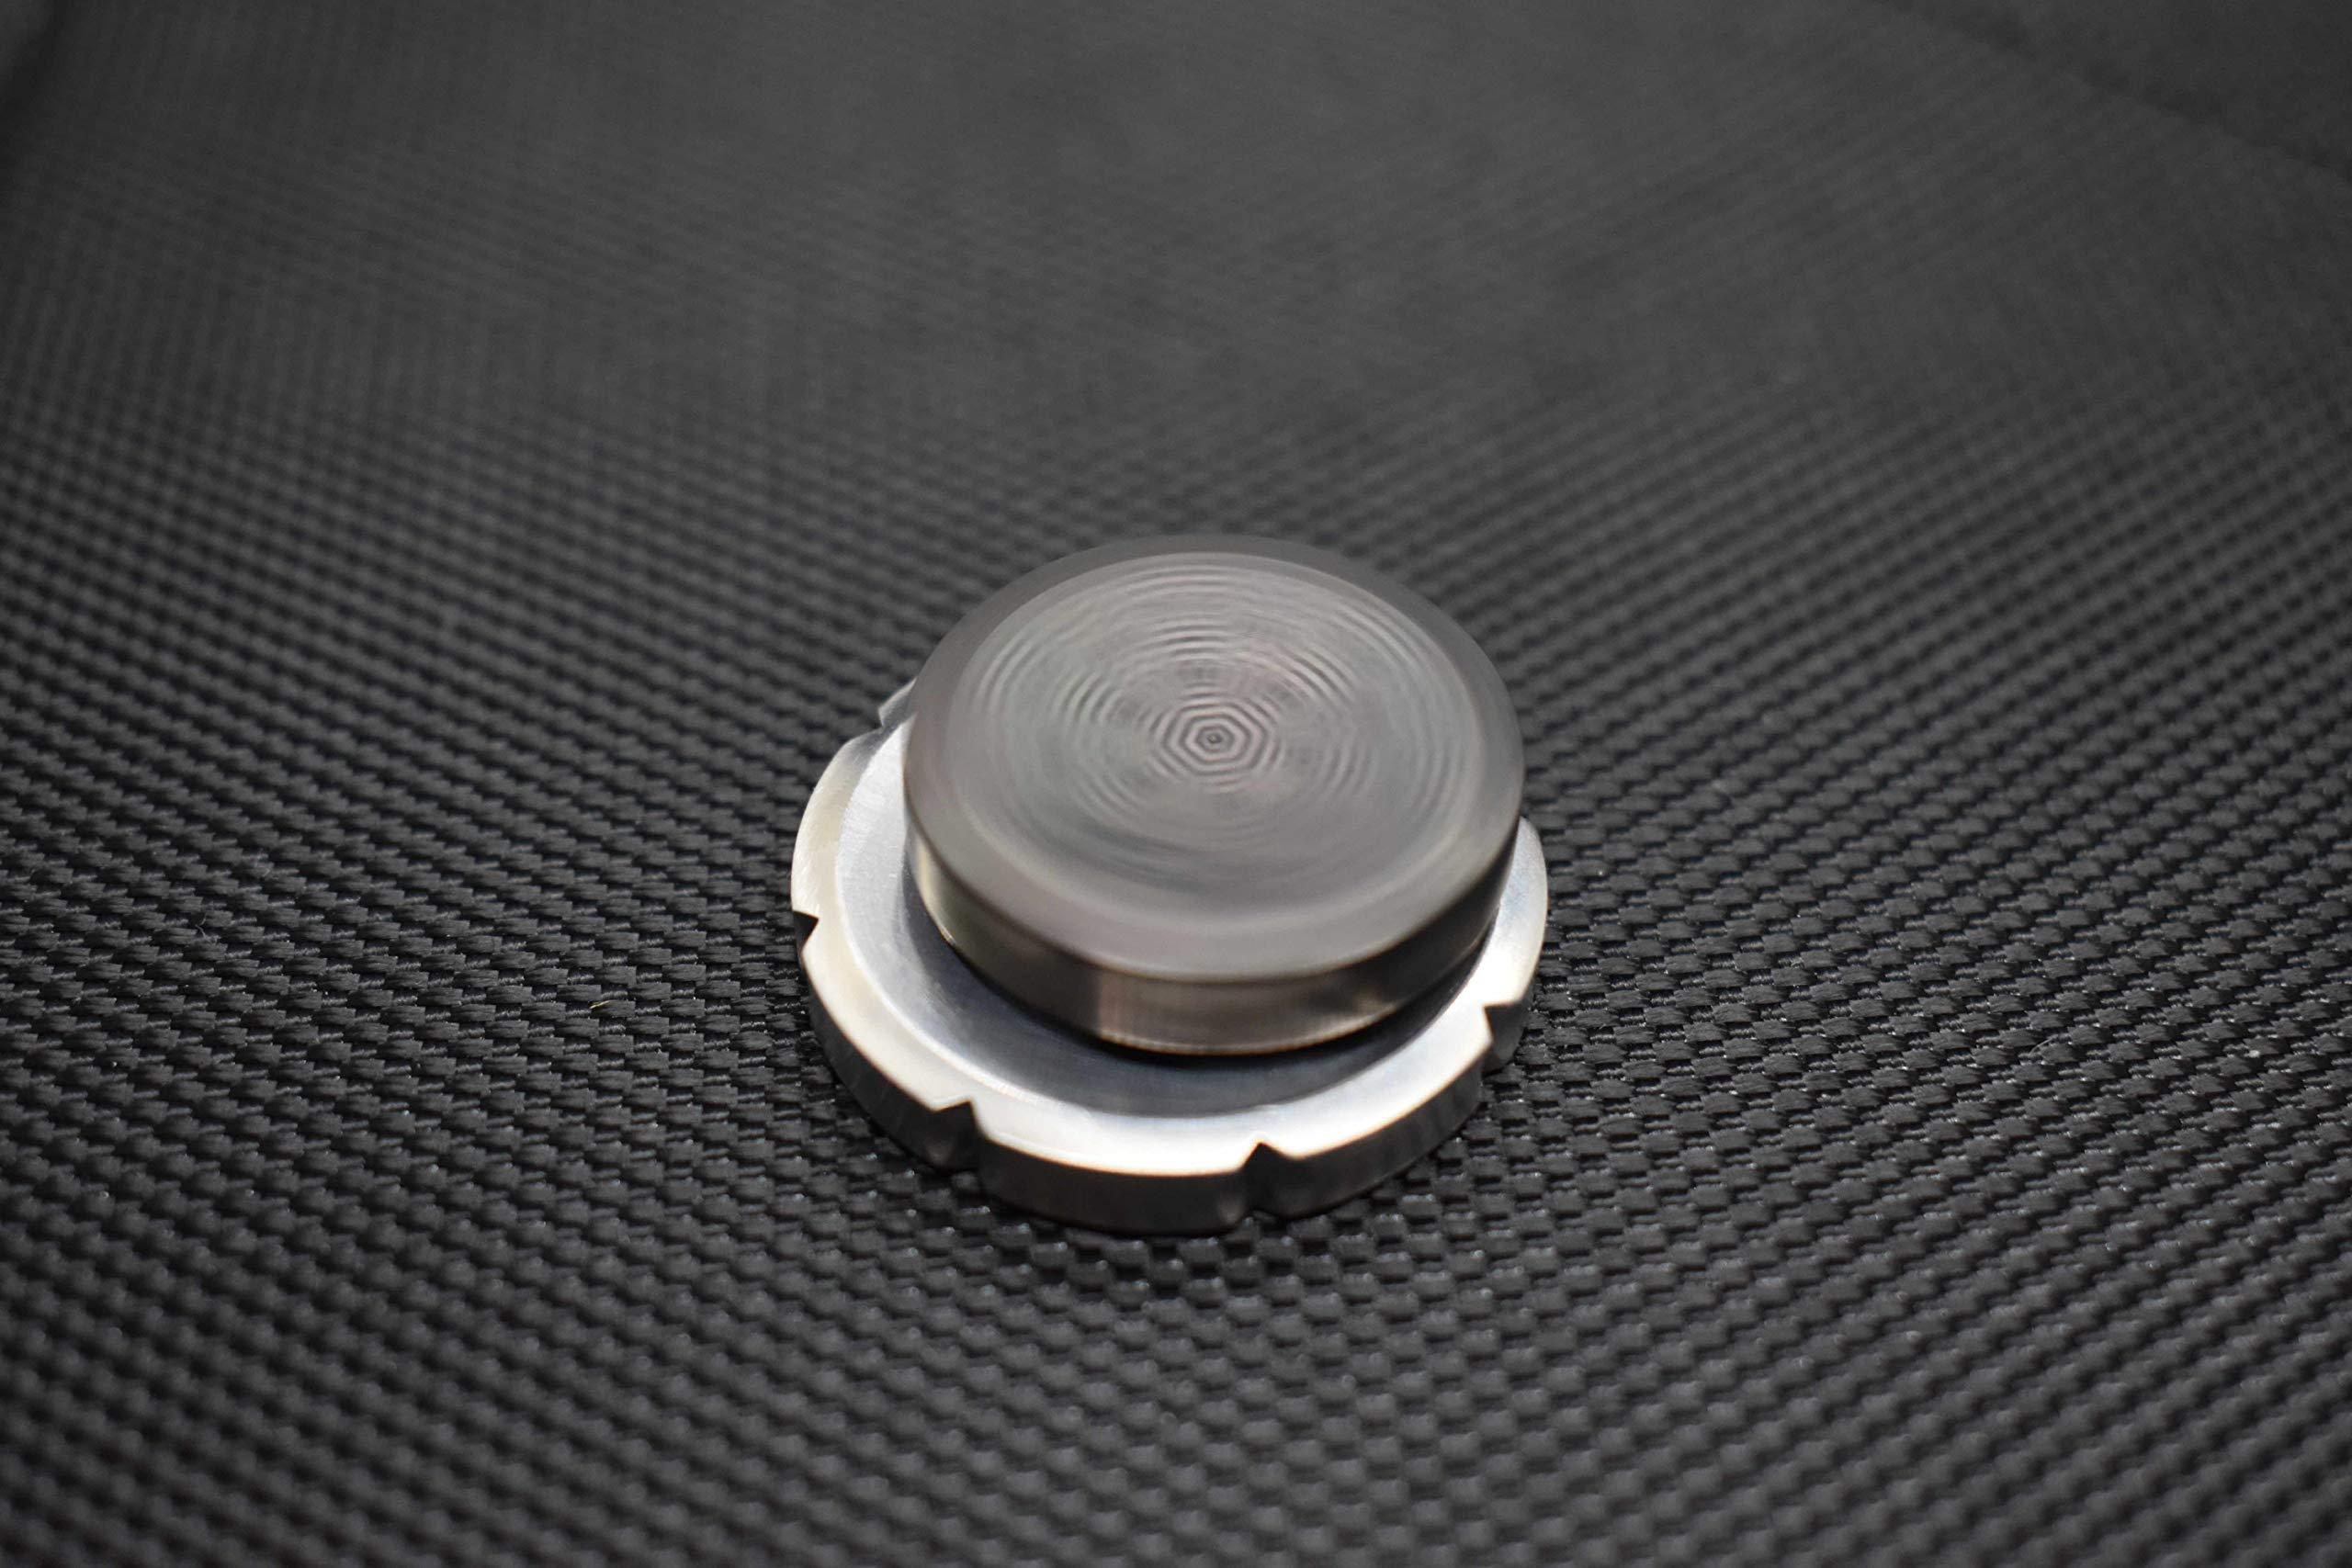 MetonBoss Worry Coin Black Zirconium & Ruby Bearing   Everyday Carry Gear   Precision-Made and Desktop Display by MetonBoss (Image #8)